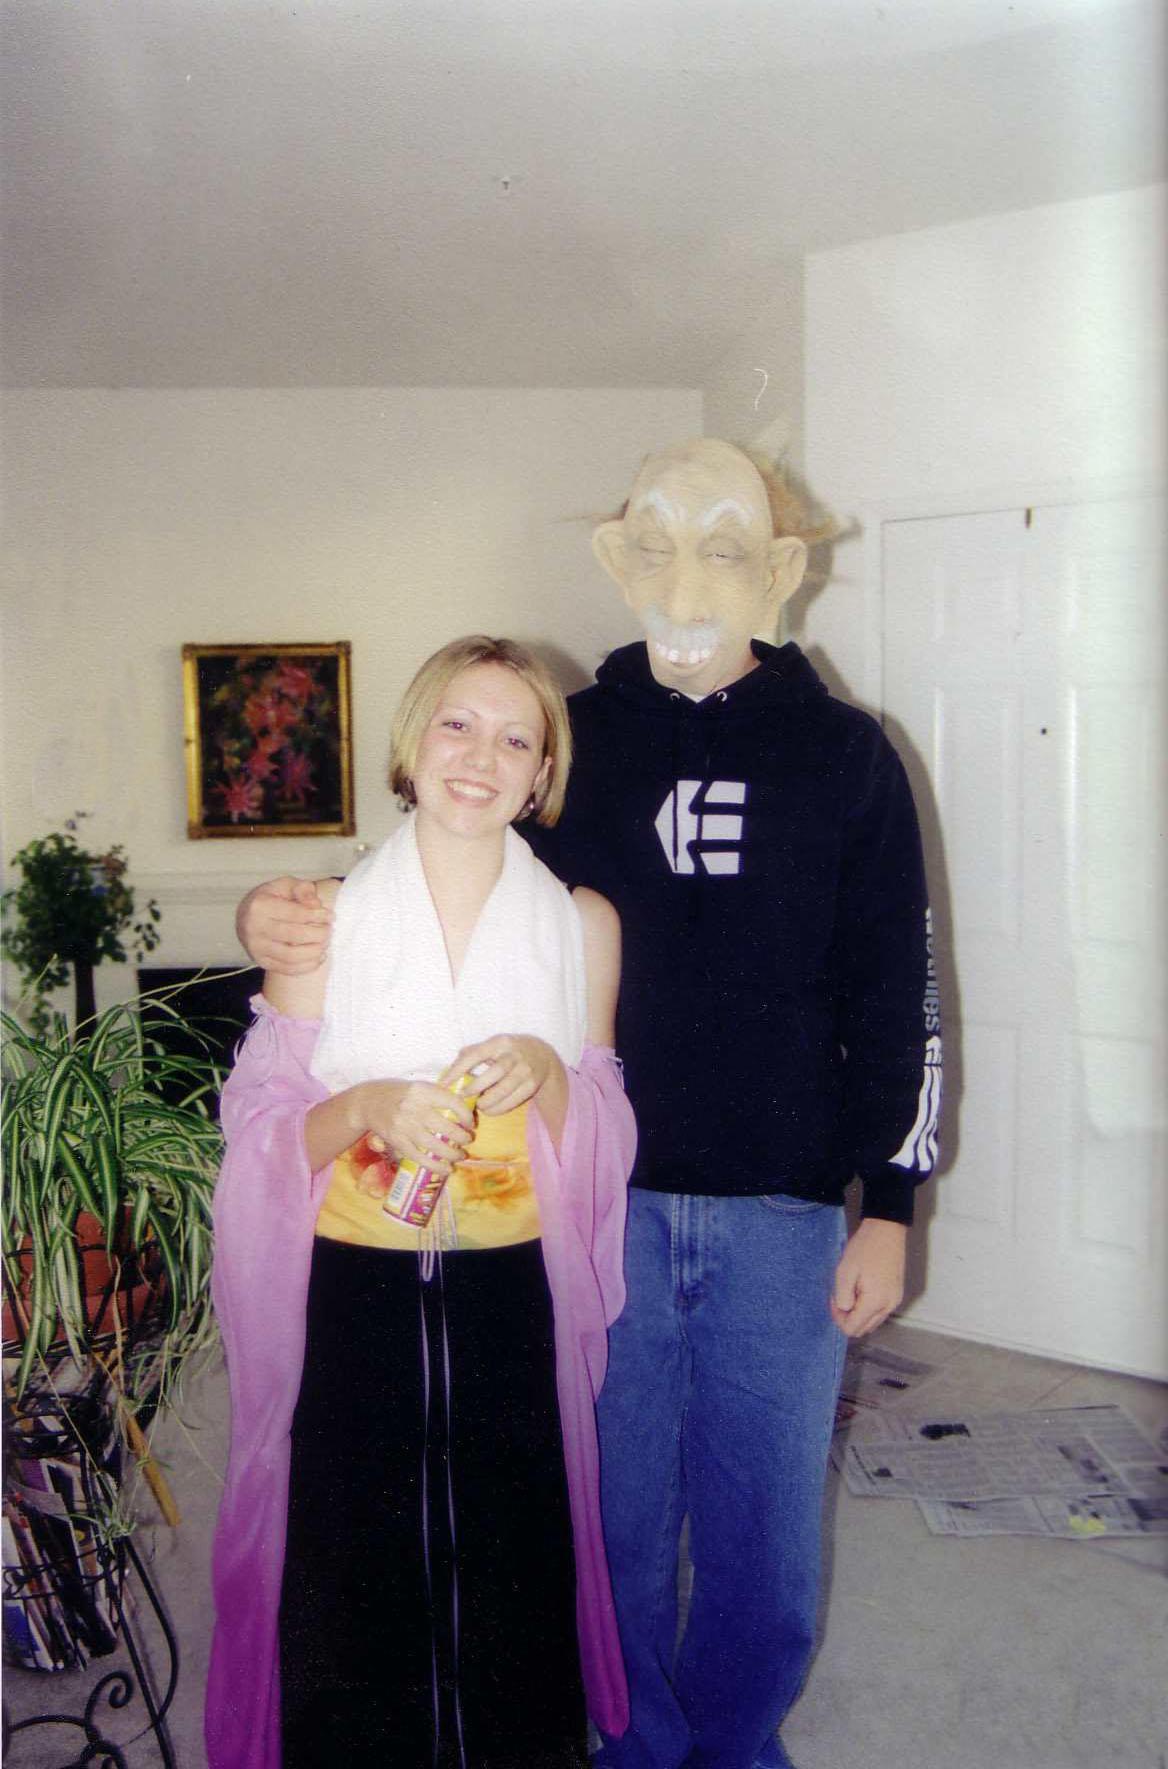 Halloween memories by psychedelicpixie